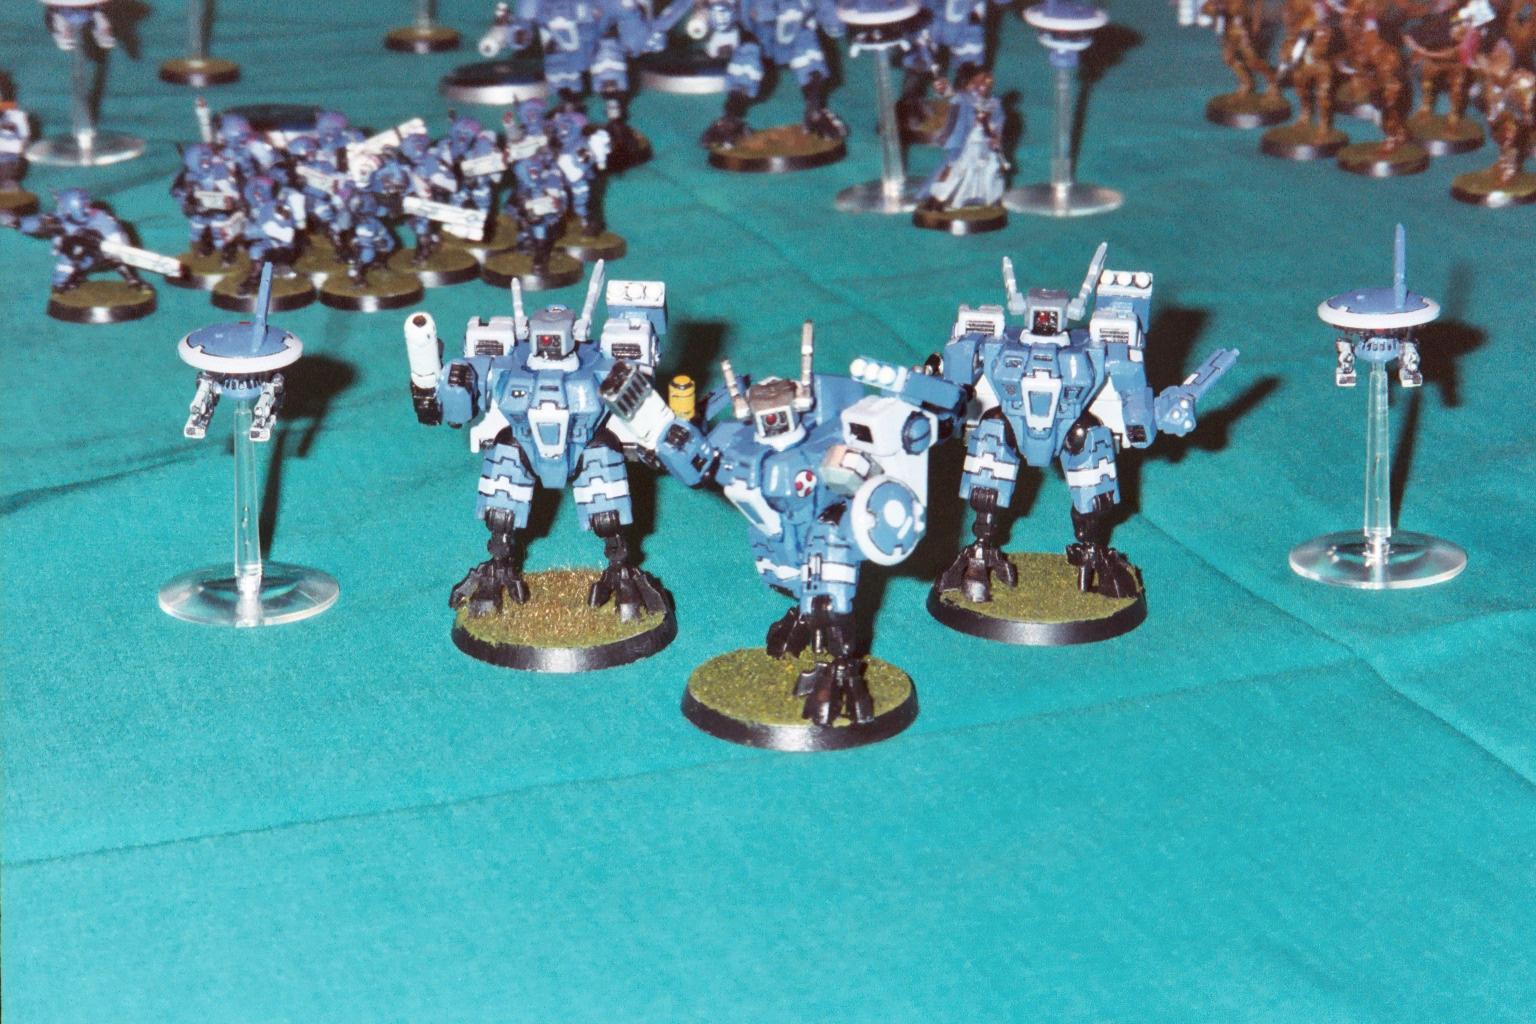 Blue, Crisis Battlesuit, Drone, Fusion Blaster, Headquarters, Missile Launcher, Plasma, Shield, Tau, Unit, Warhammer 40,000, XV8